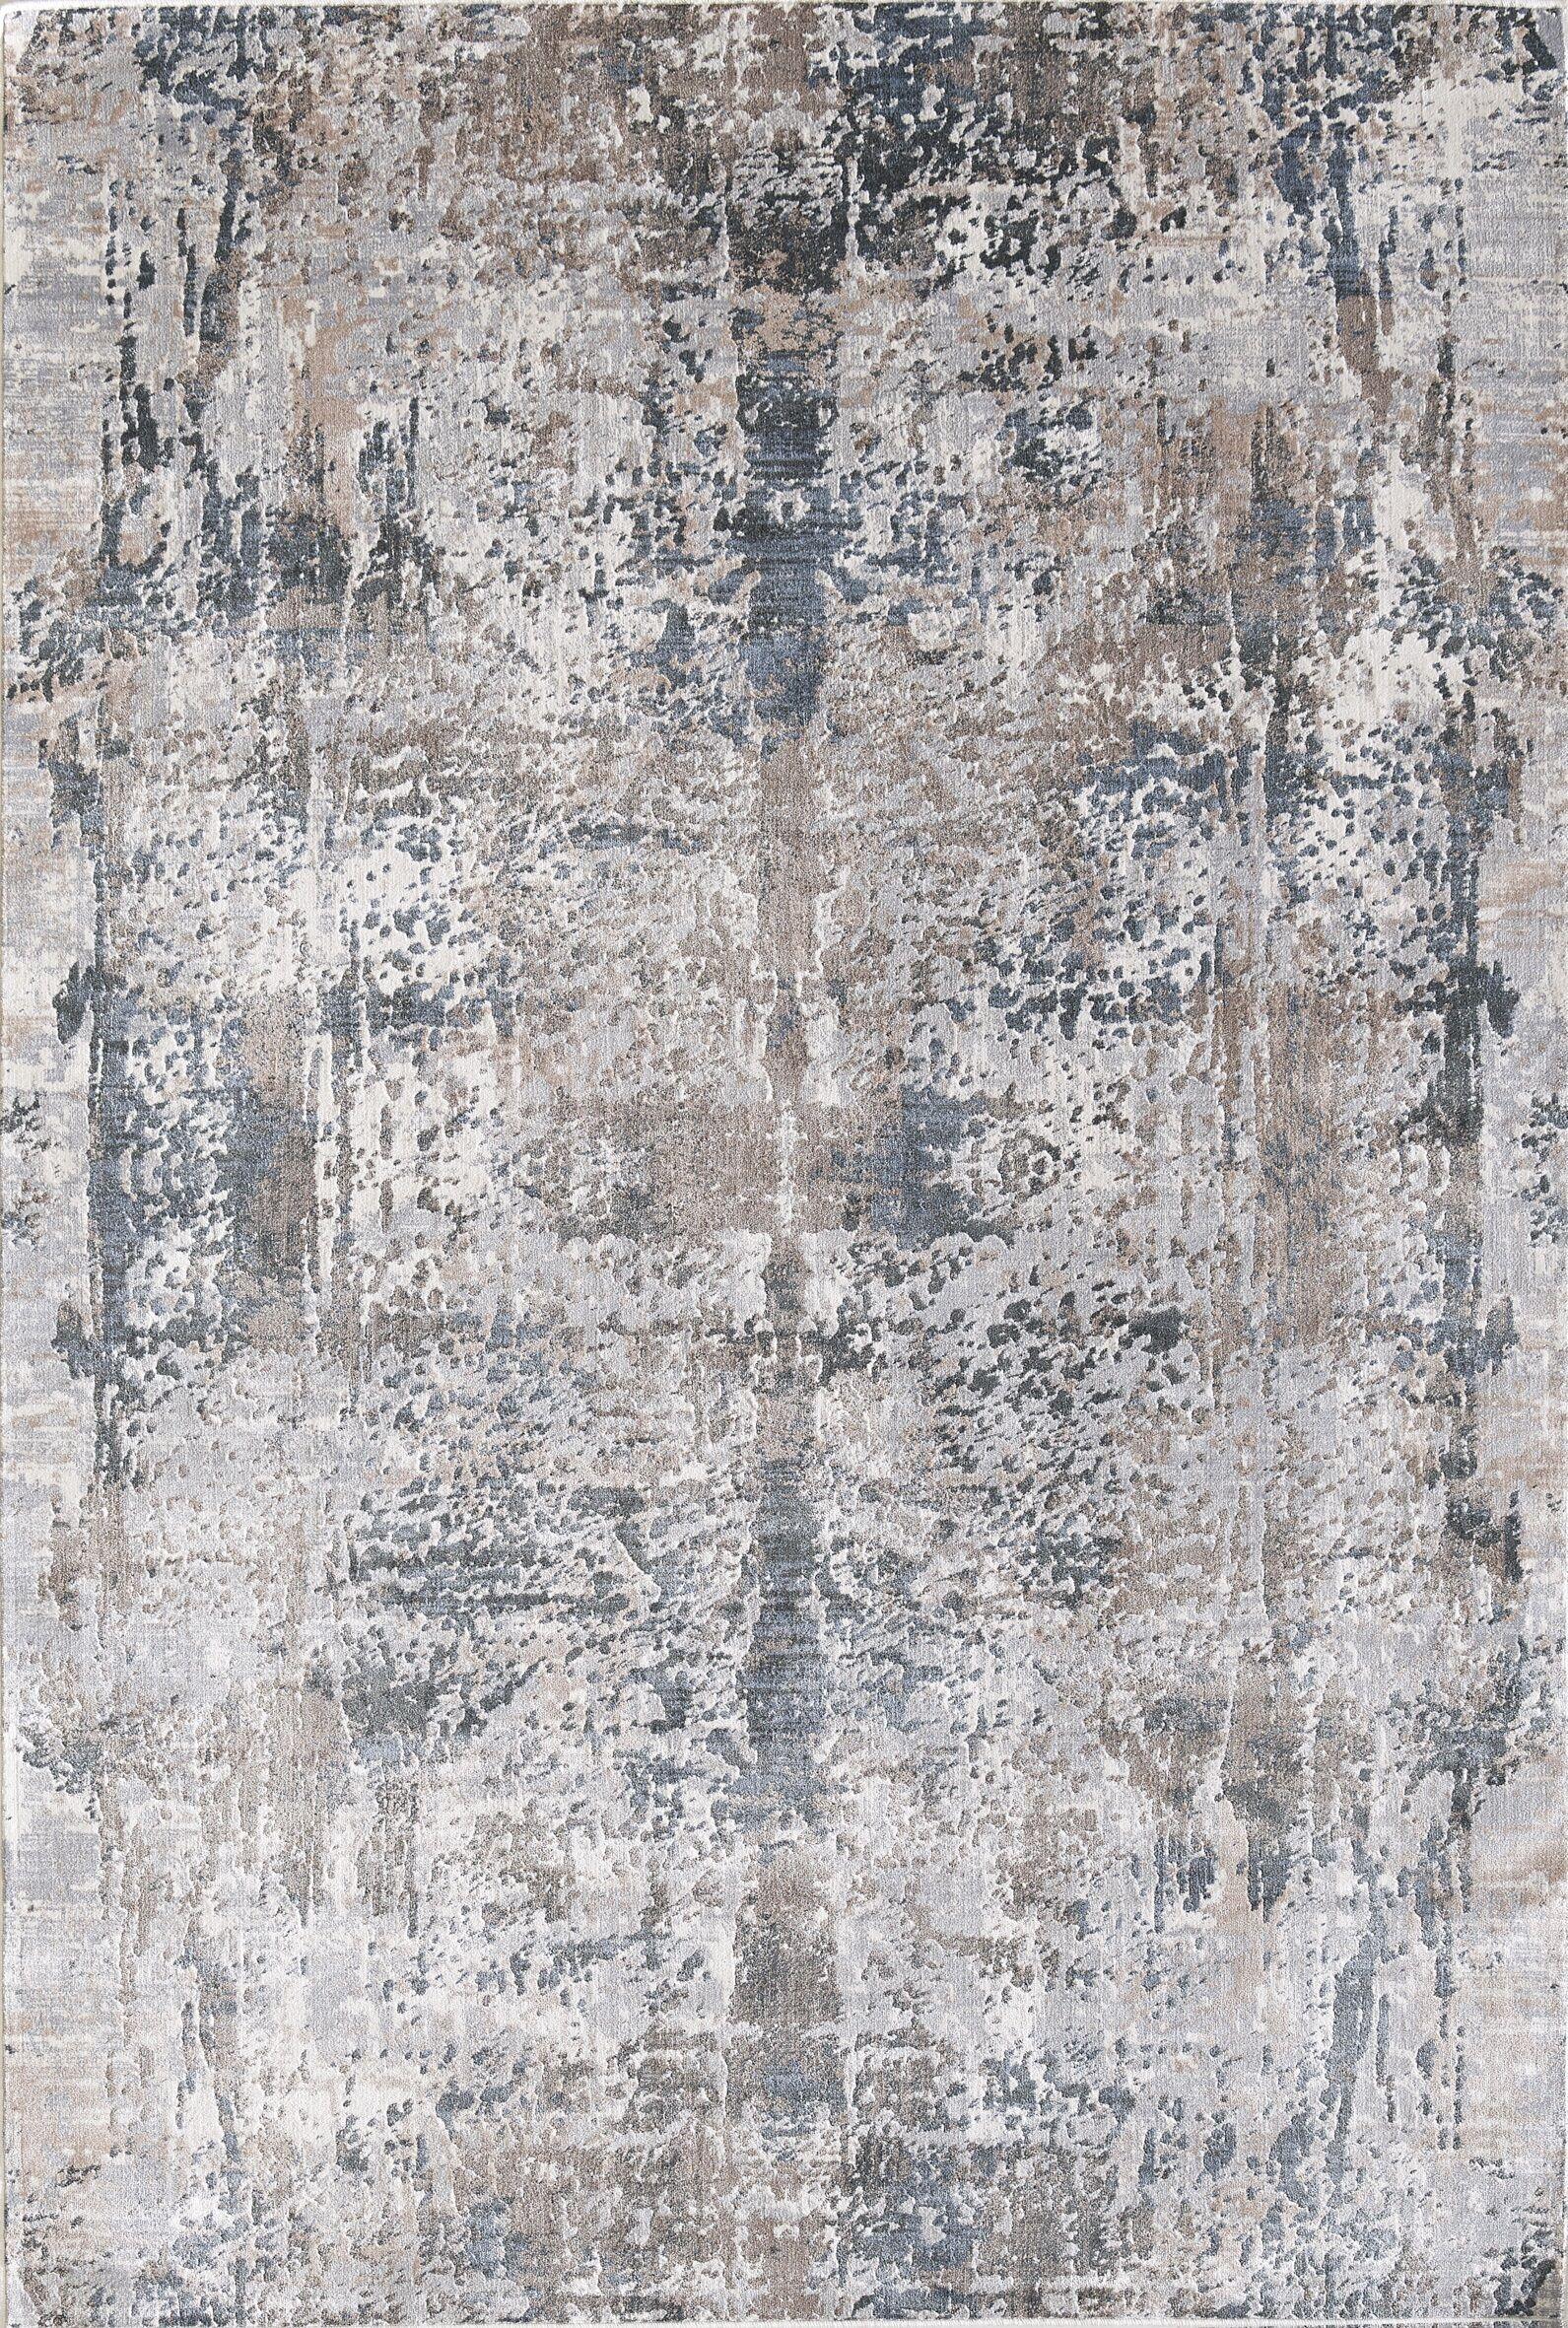 Cotton Light Brown/Beige Area Rug Rug Size: Rectangle 7'10